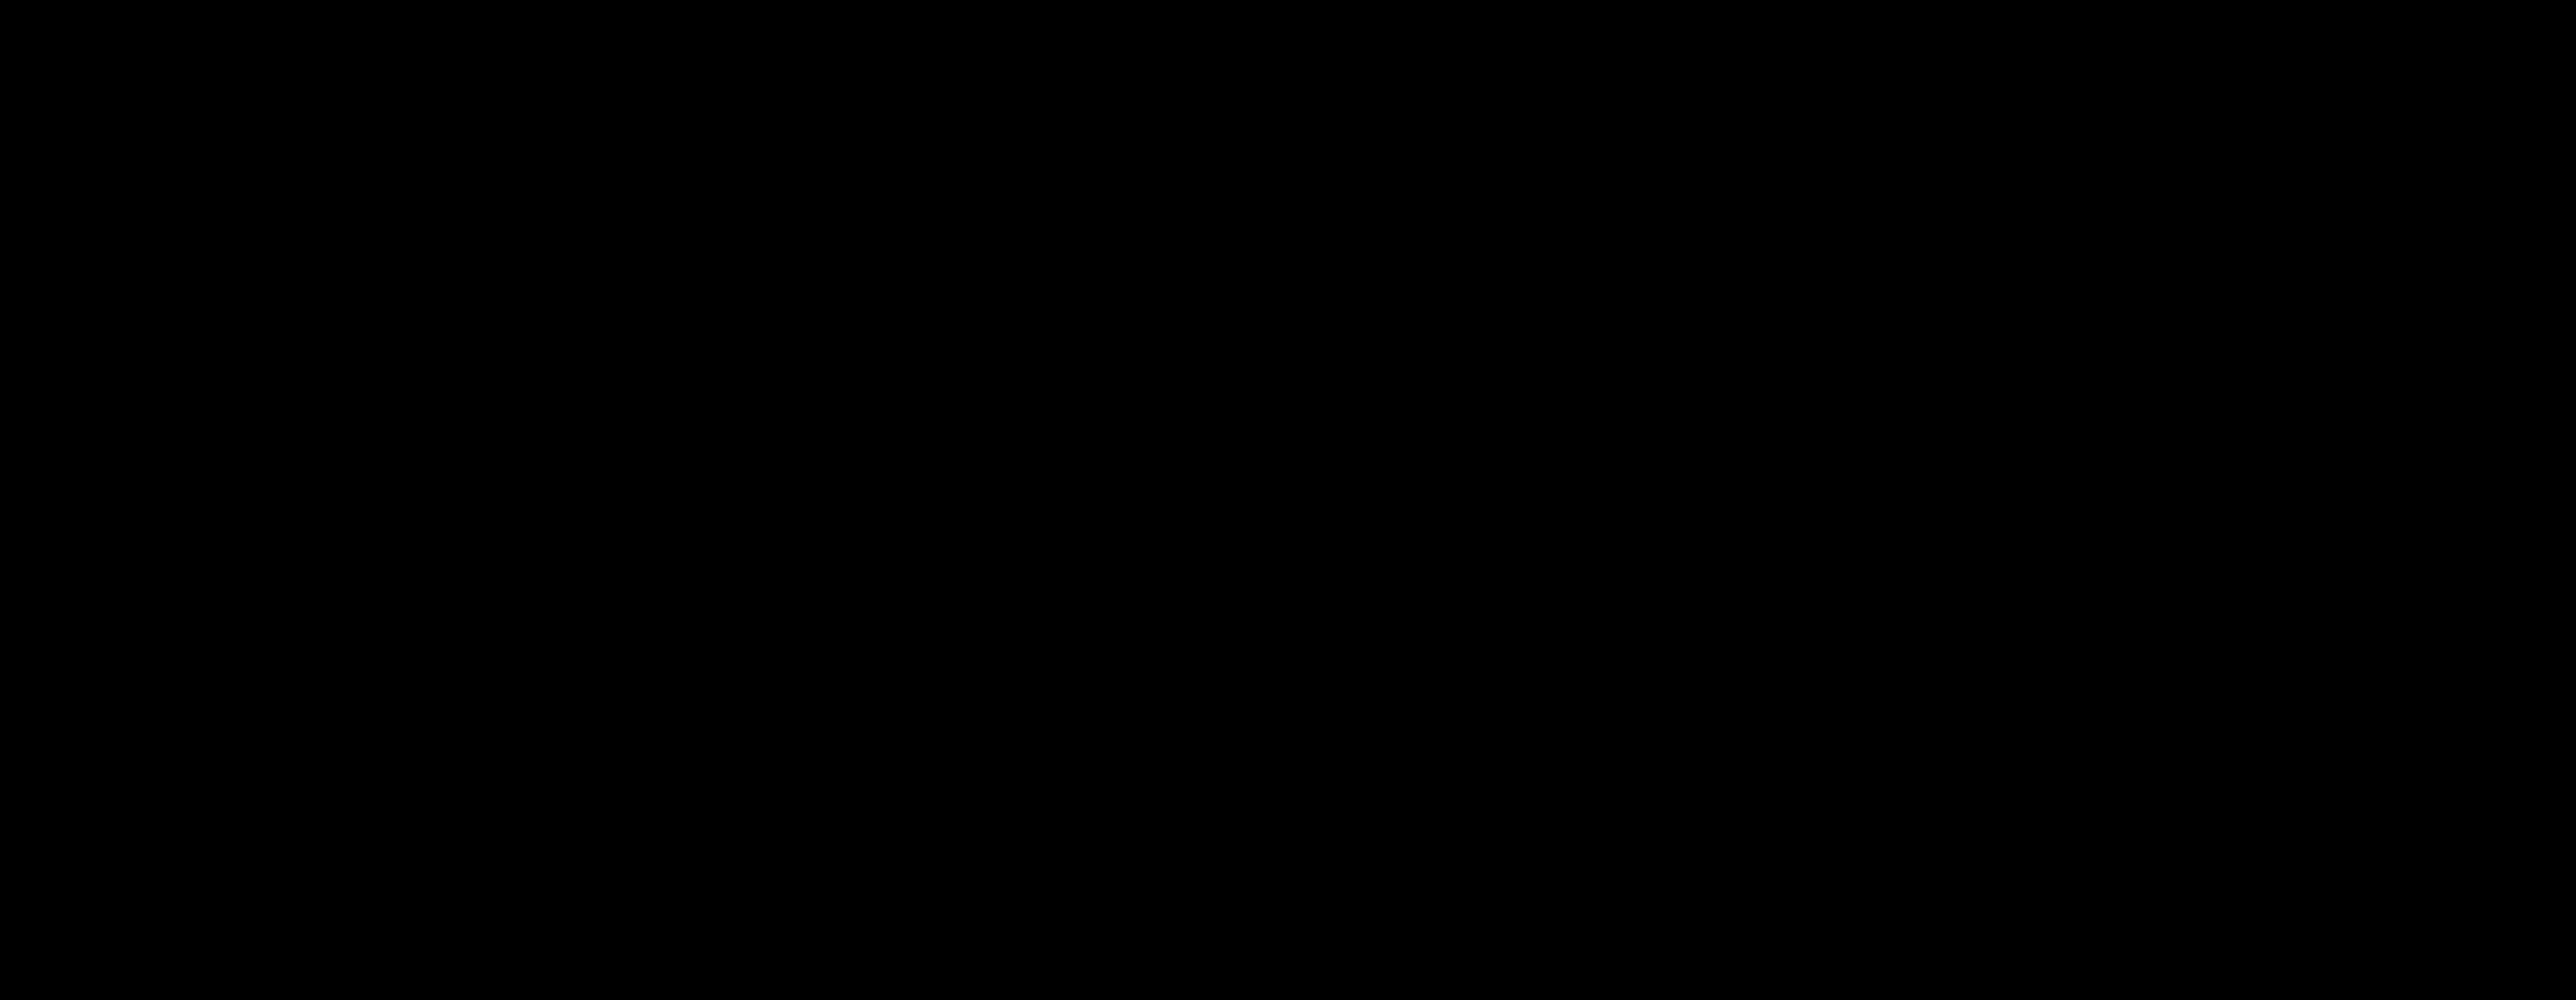 MUNIC   frame: Mod 885-1-42001